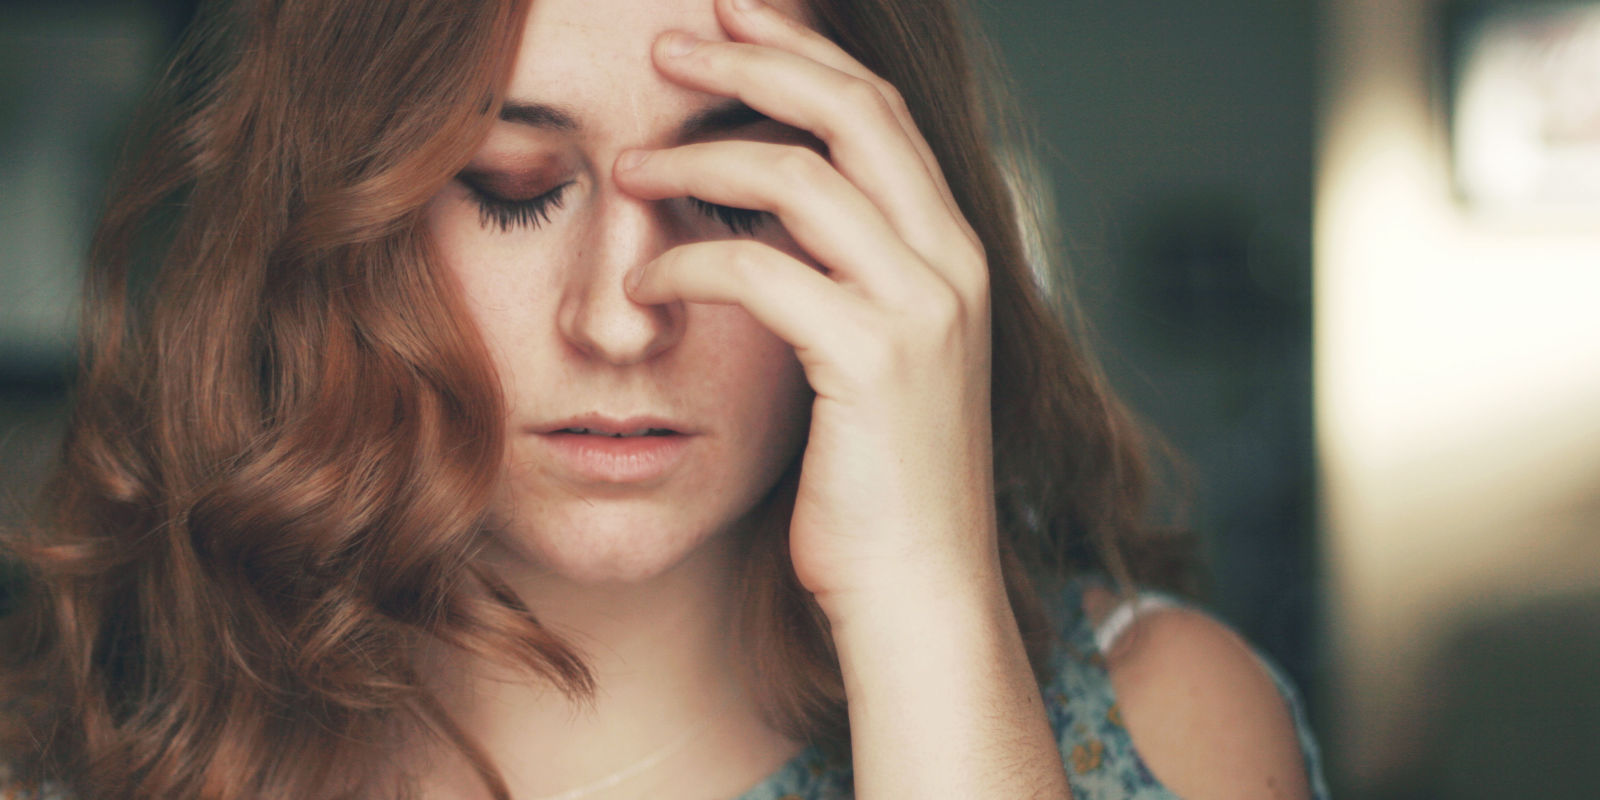 Facial exercises to loose neck fat